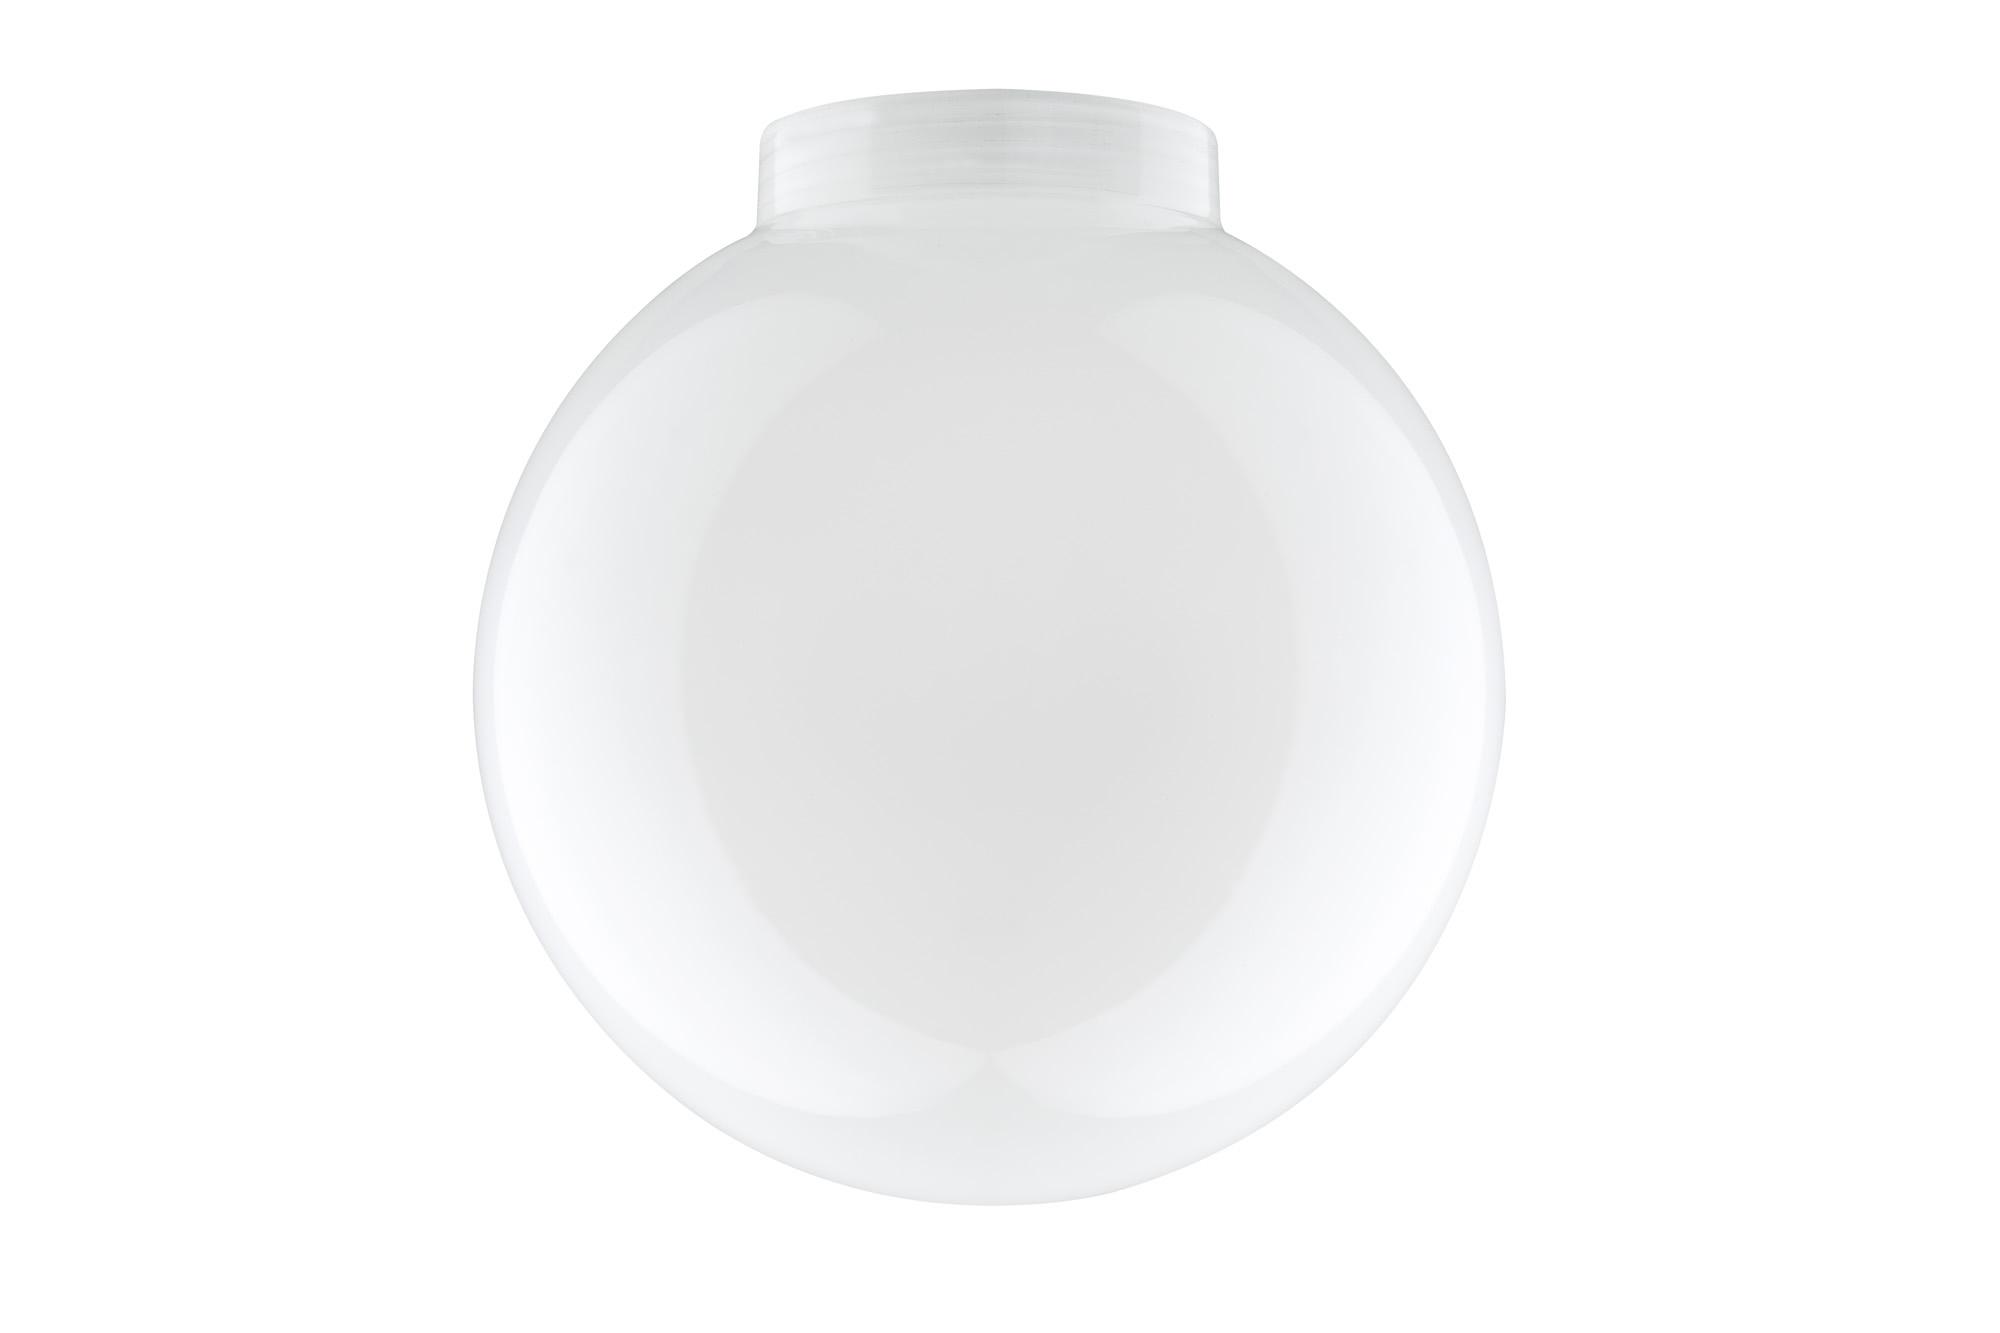 Paulmann. 92579 Плафон для DecoSystems Globe, opal, стекло